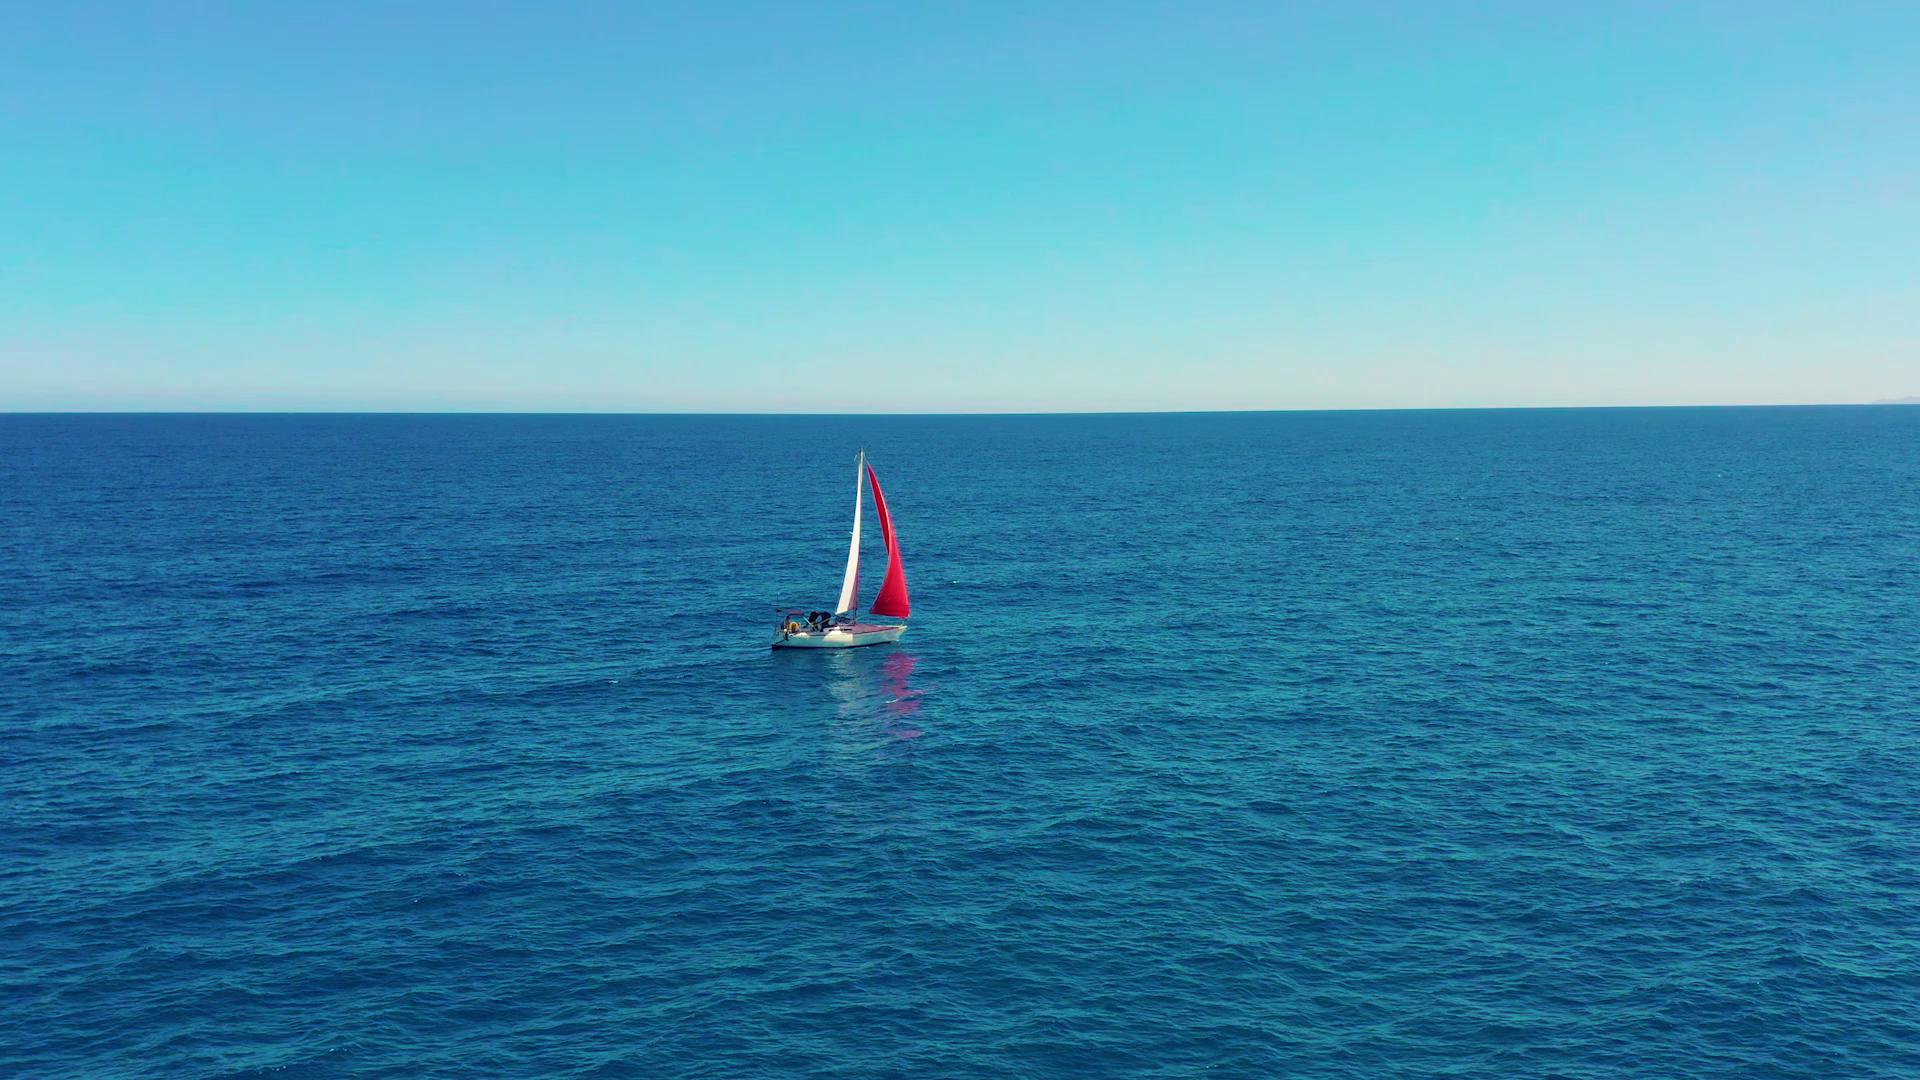 TifGroup - Boat